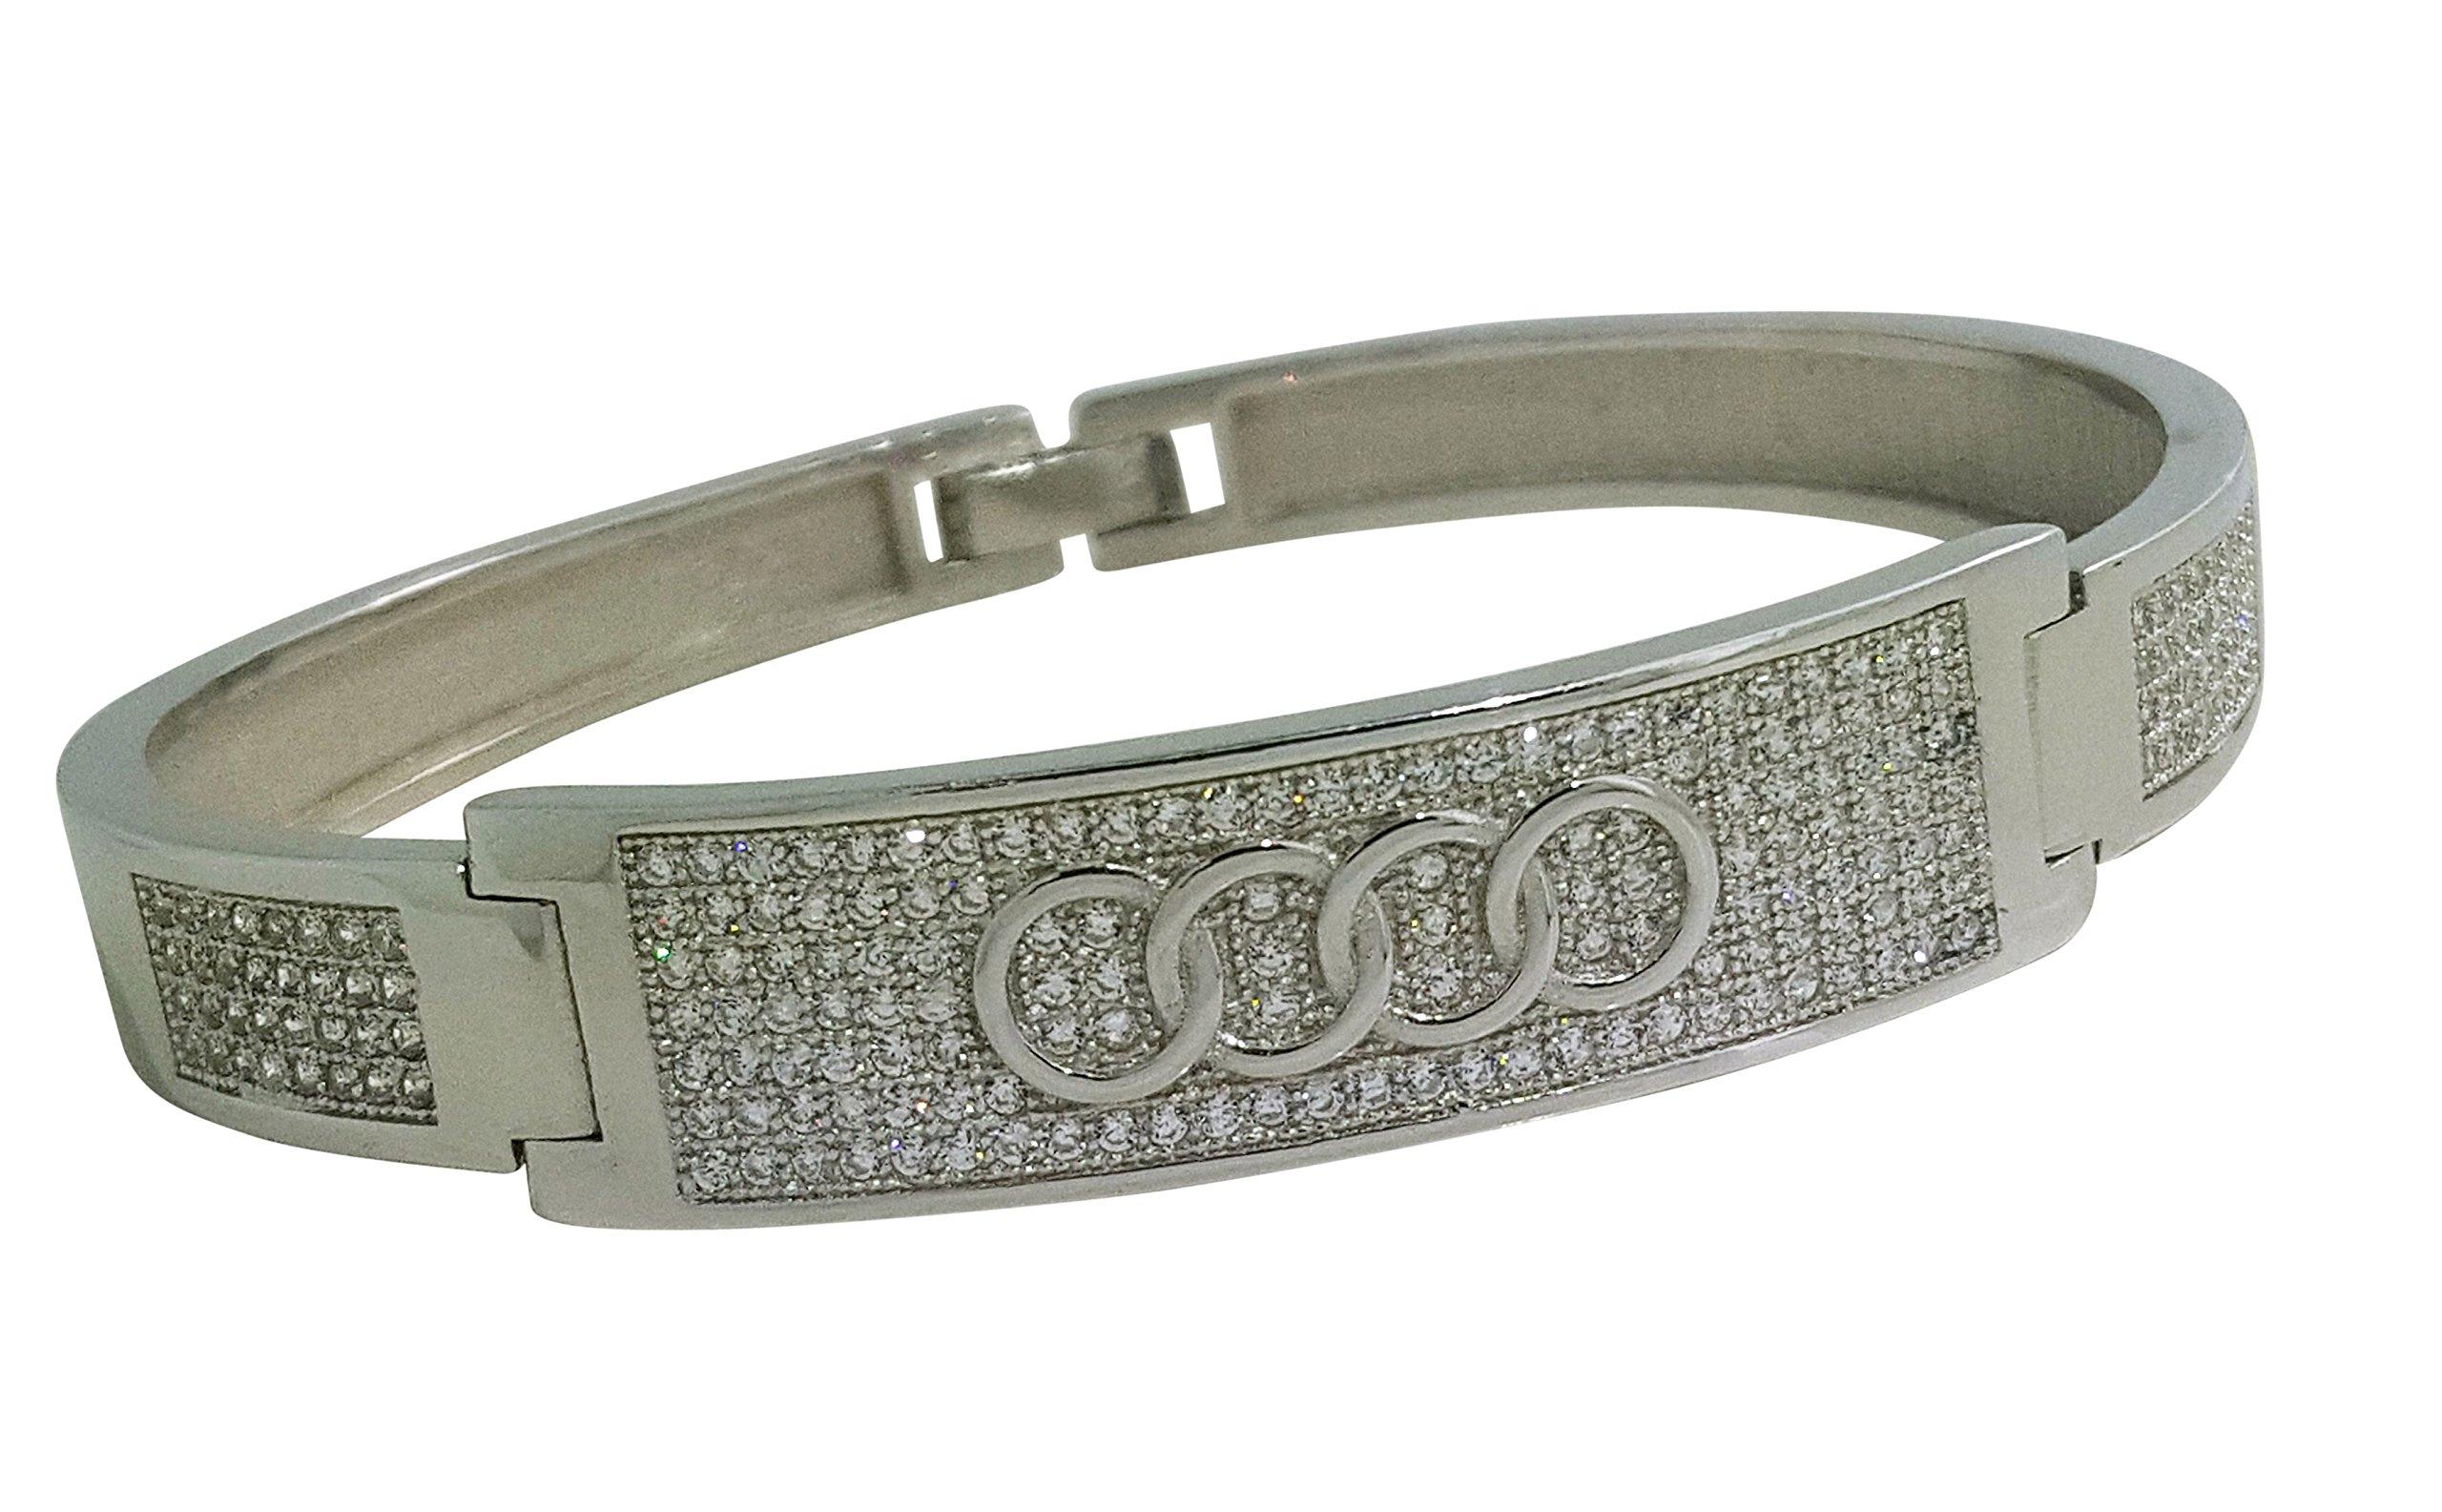 925 Solid Sterling Silver Bangle Bracelet Beautiful Intricately Made Cz Bracelet AUDI AND JAGUAR DESIGN FR21 (AUDI)